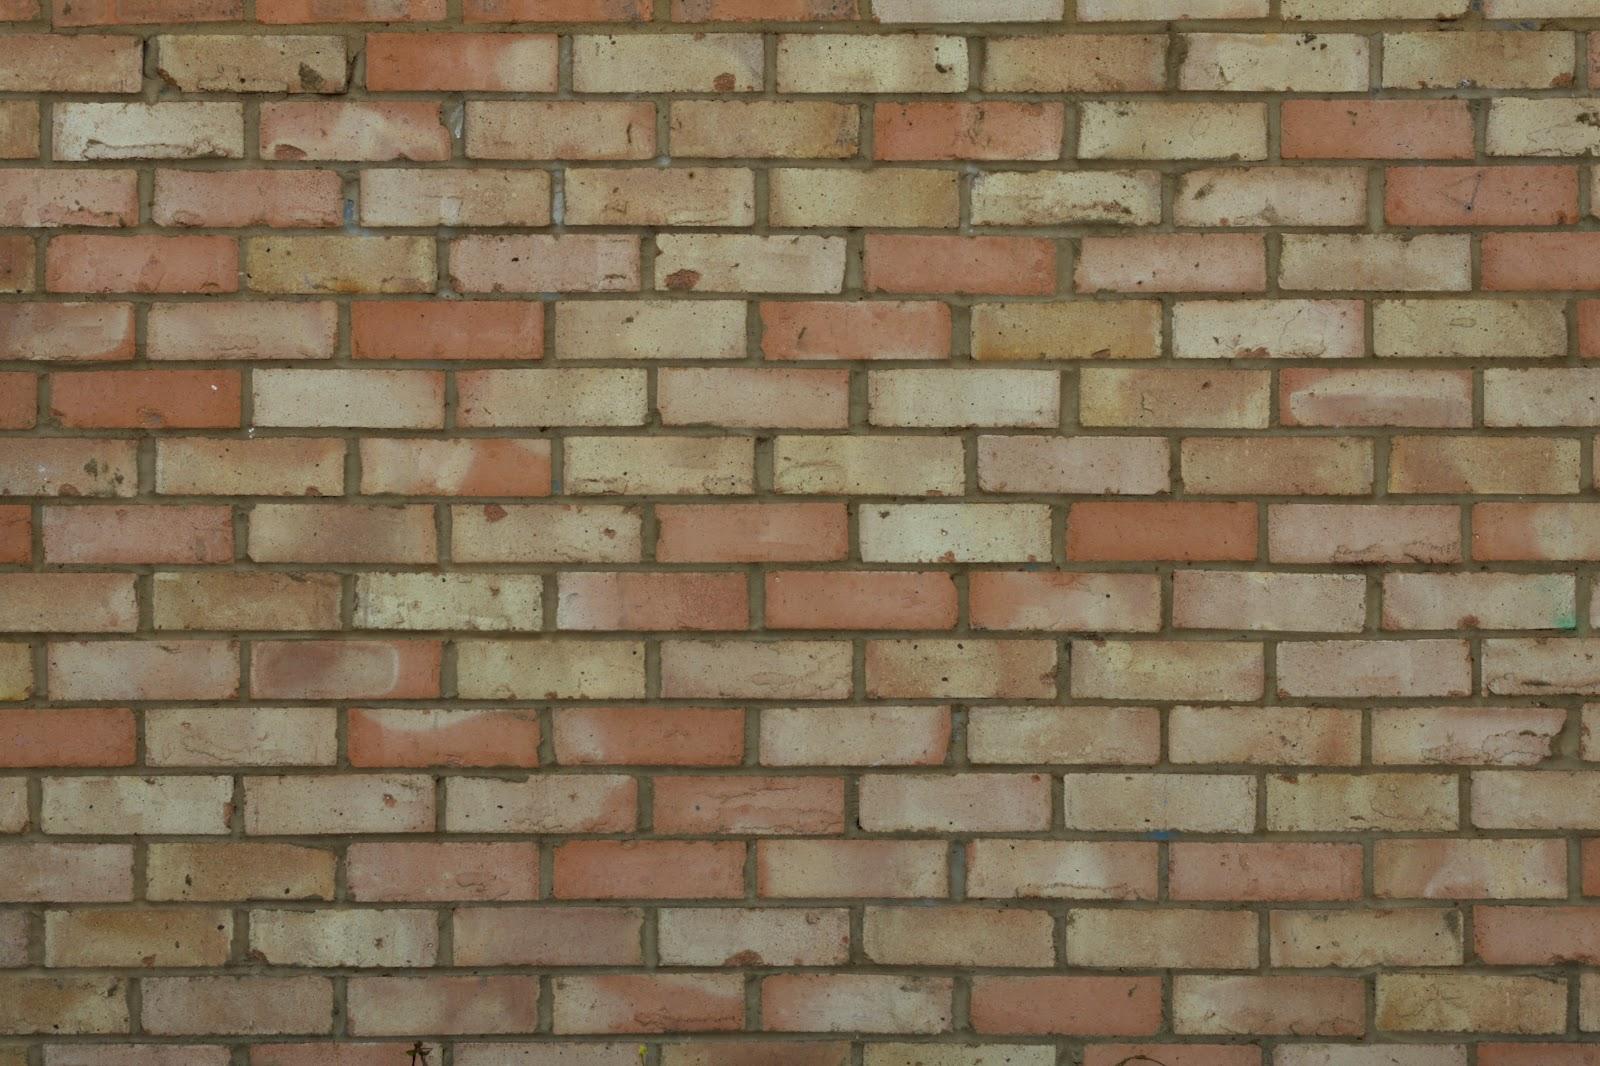 Brick wall building texture ver 5